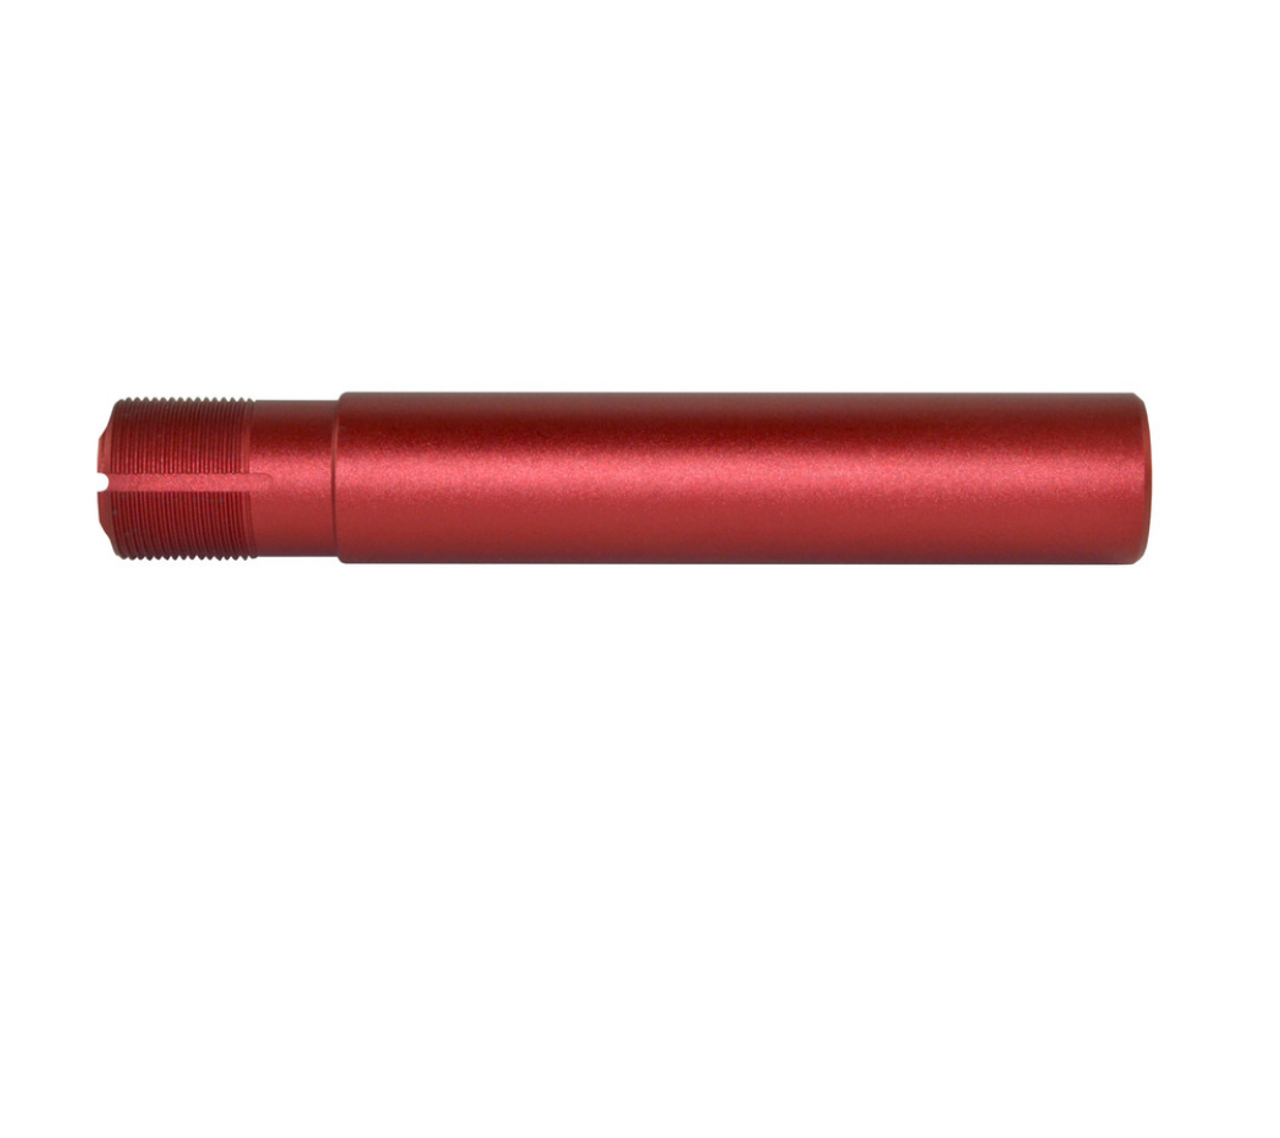 "AR-15 Pistol Buffer Tube, 7.3"" Anodized"